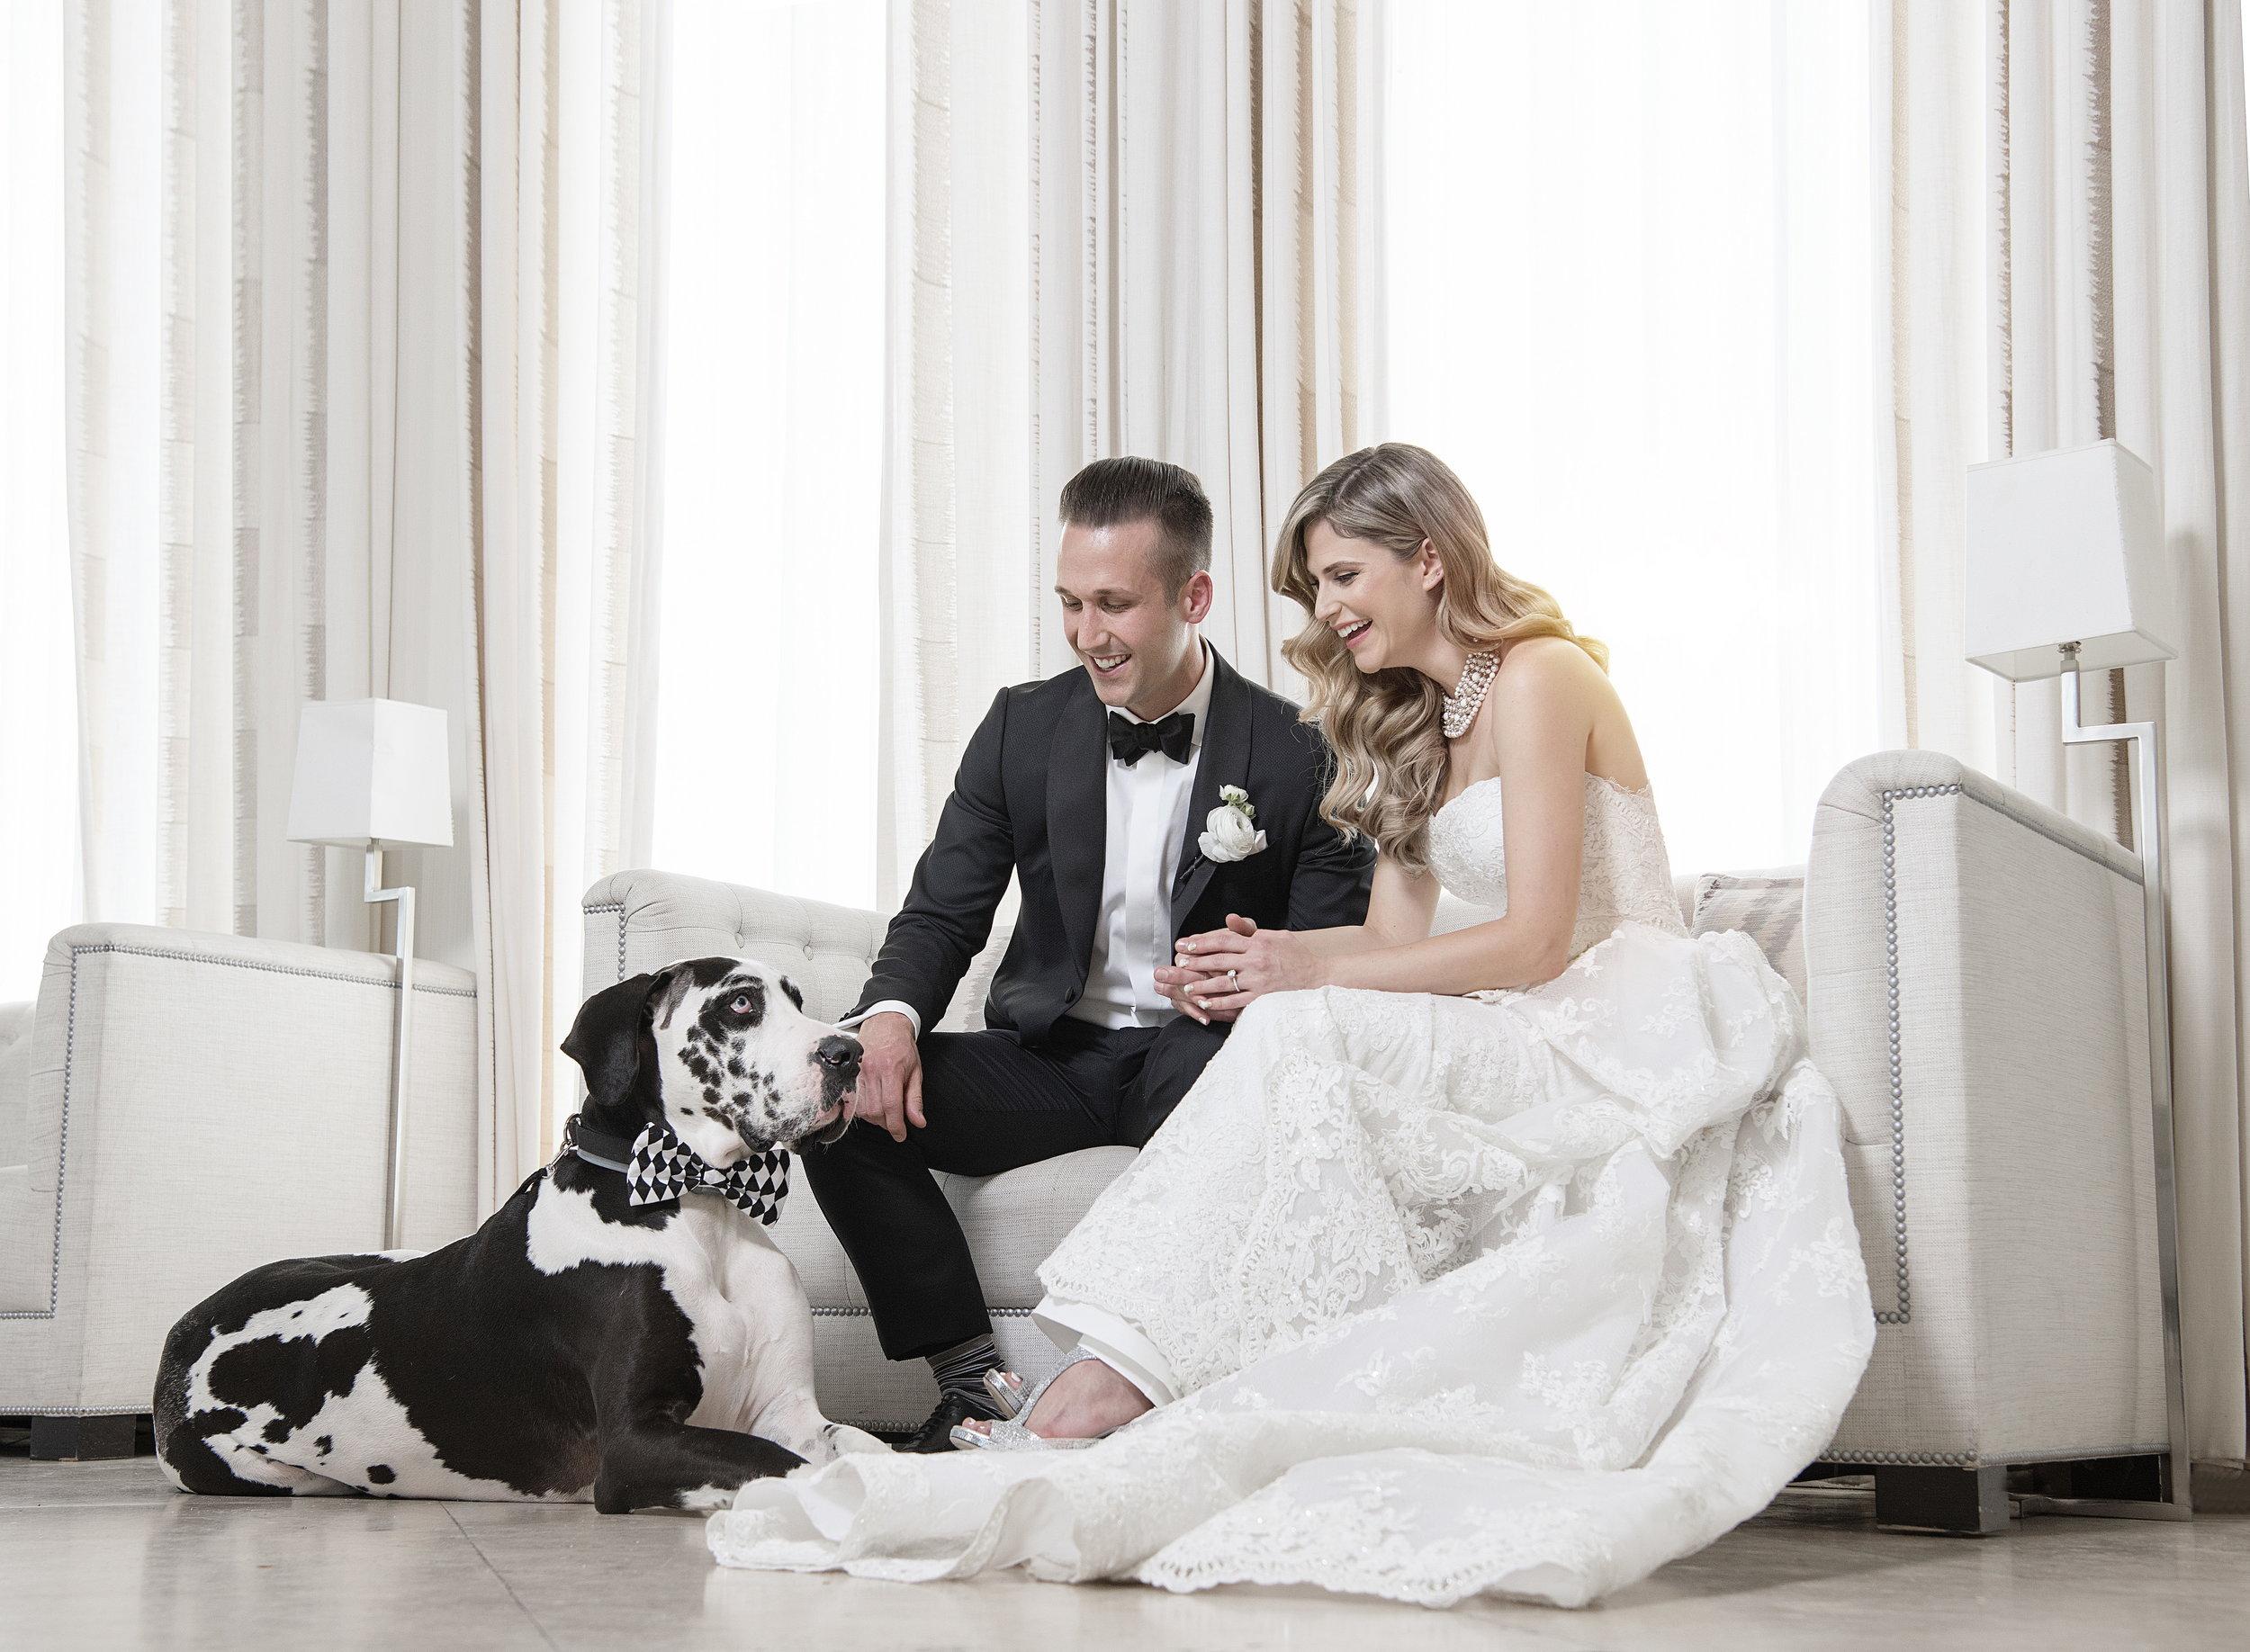 wedding-photography-Miami-Fort-lauderdale-0002.jpg